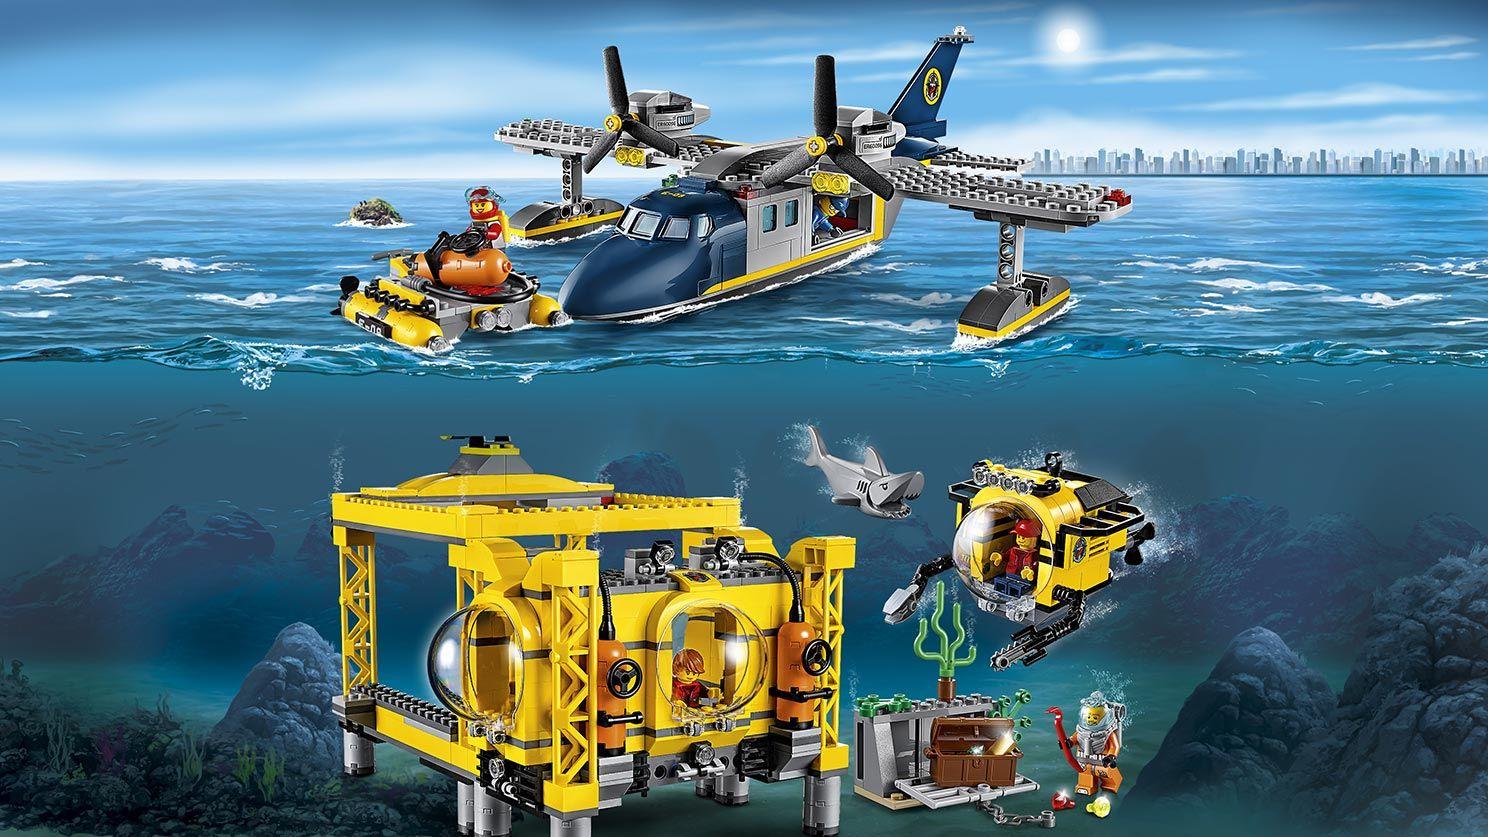 Deep Sea Operation Base With Images Lego City Lego Minifigs Lego City Sets